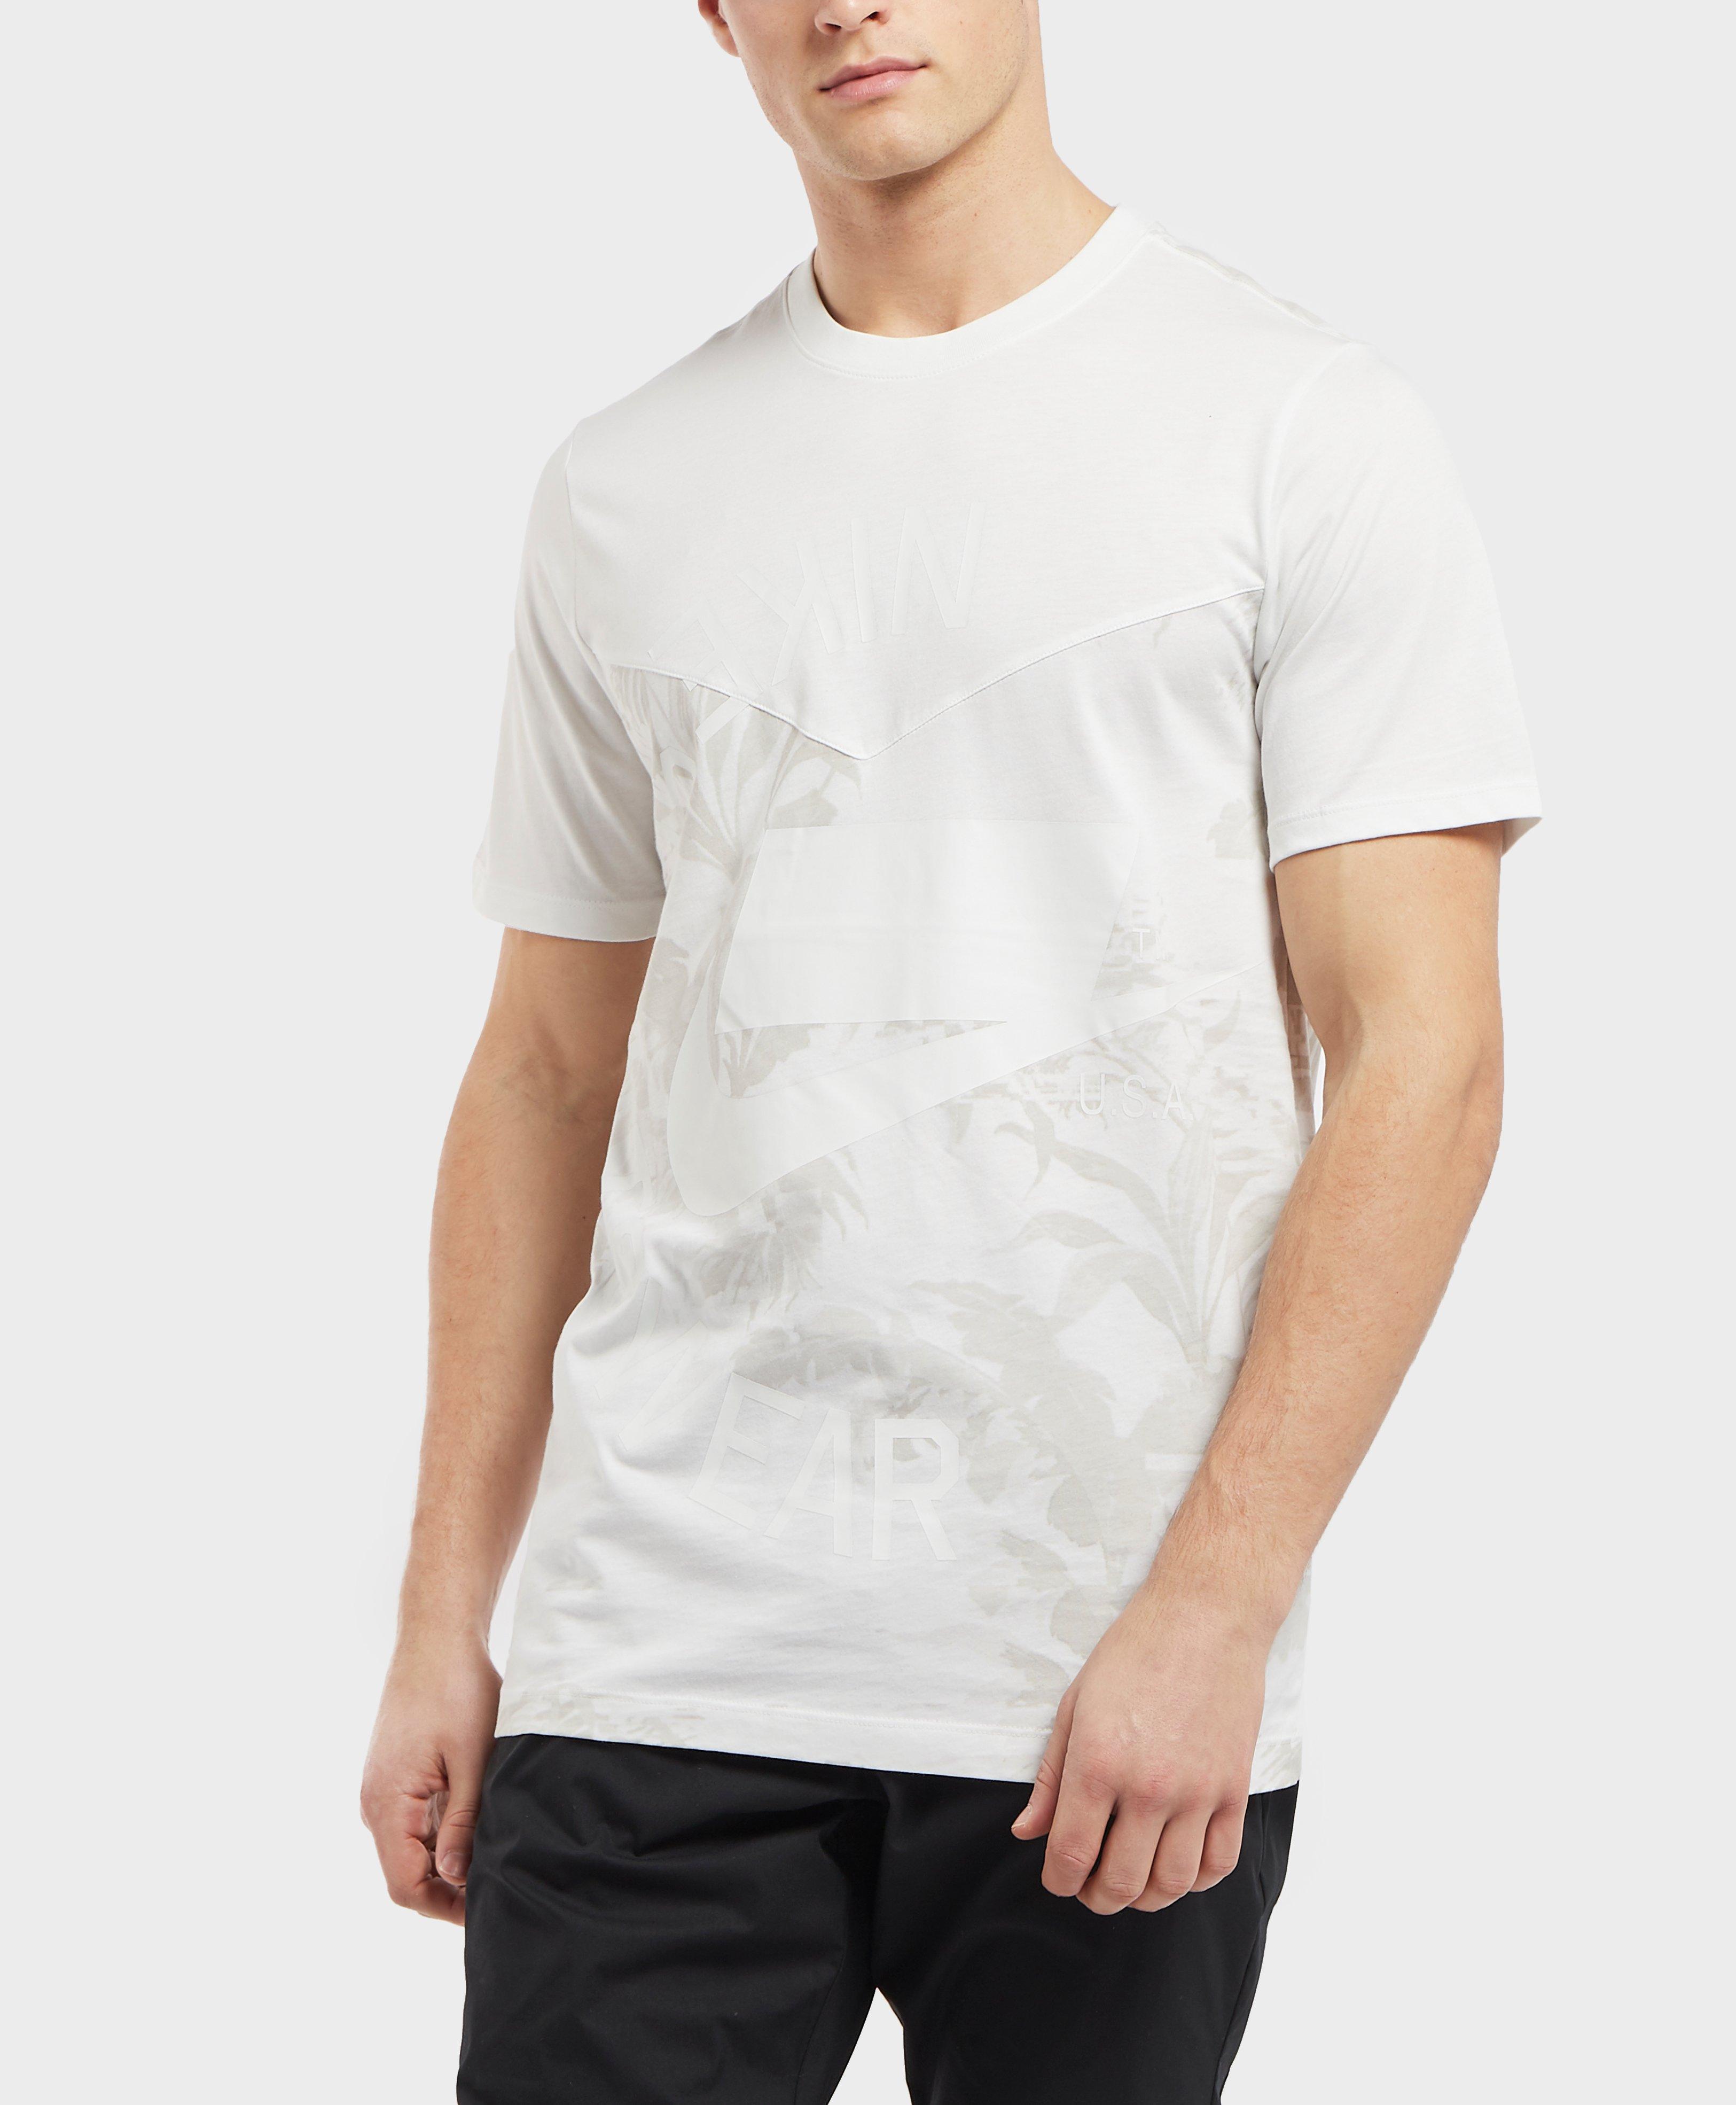 786732cc3 Nike Nsw 2 Short Sleeve T-shirt in White for Men - Lyst